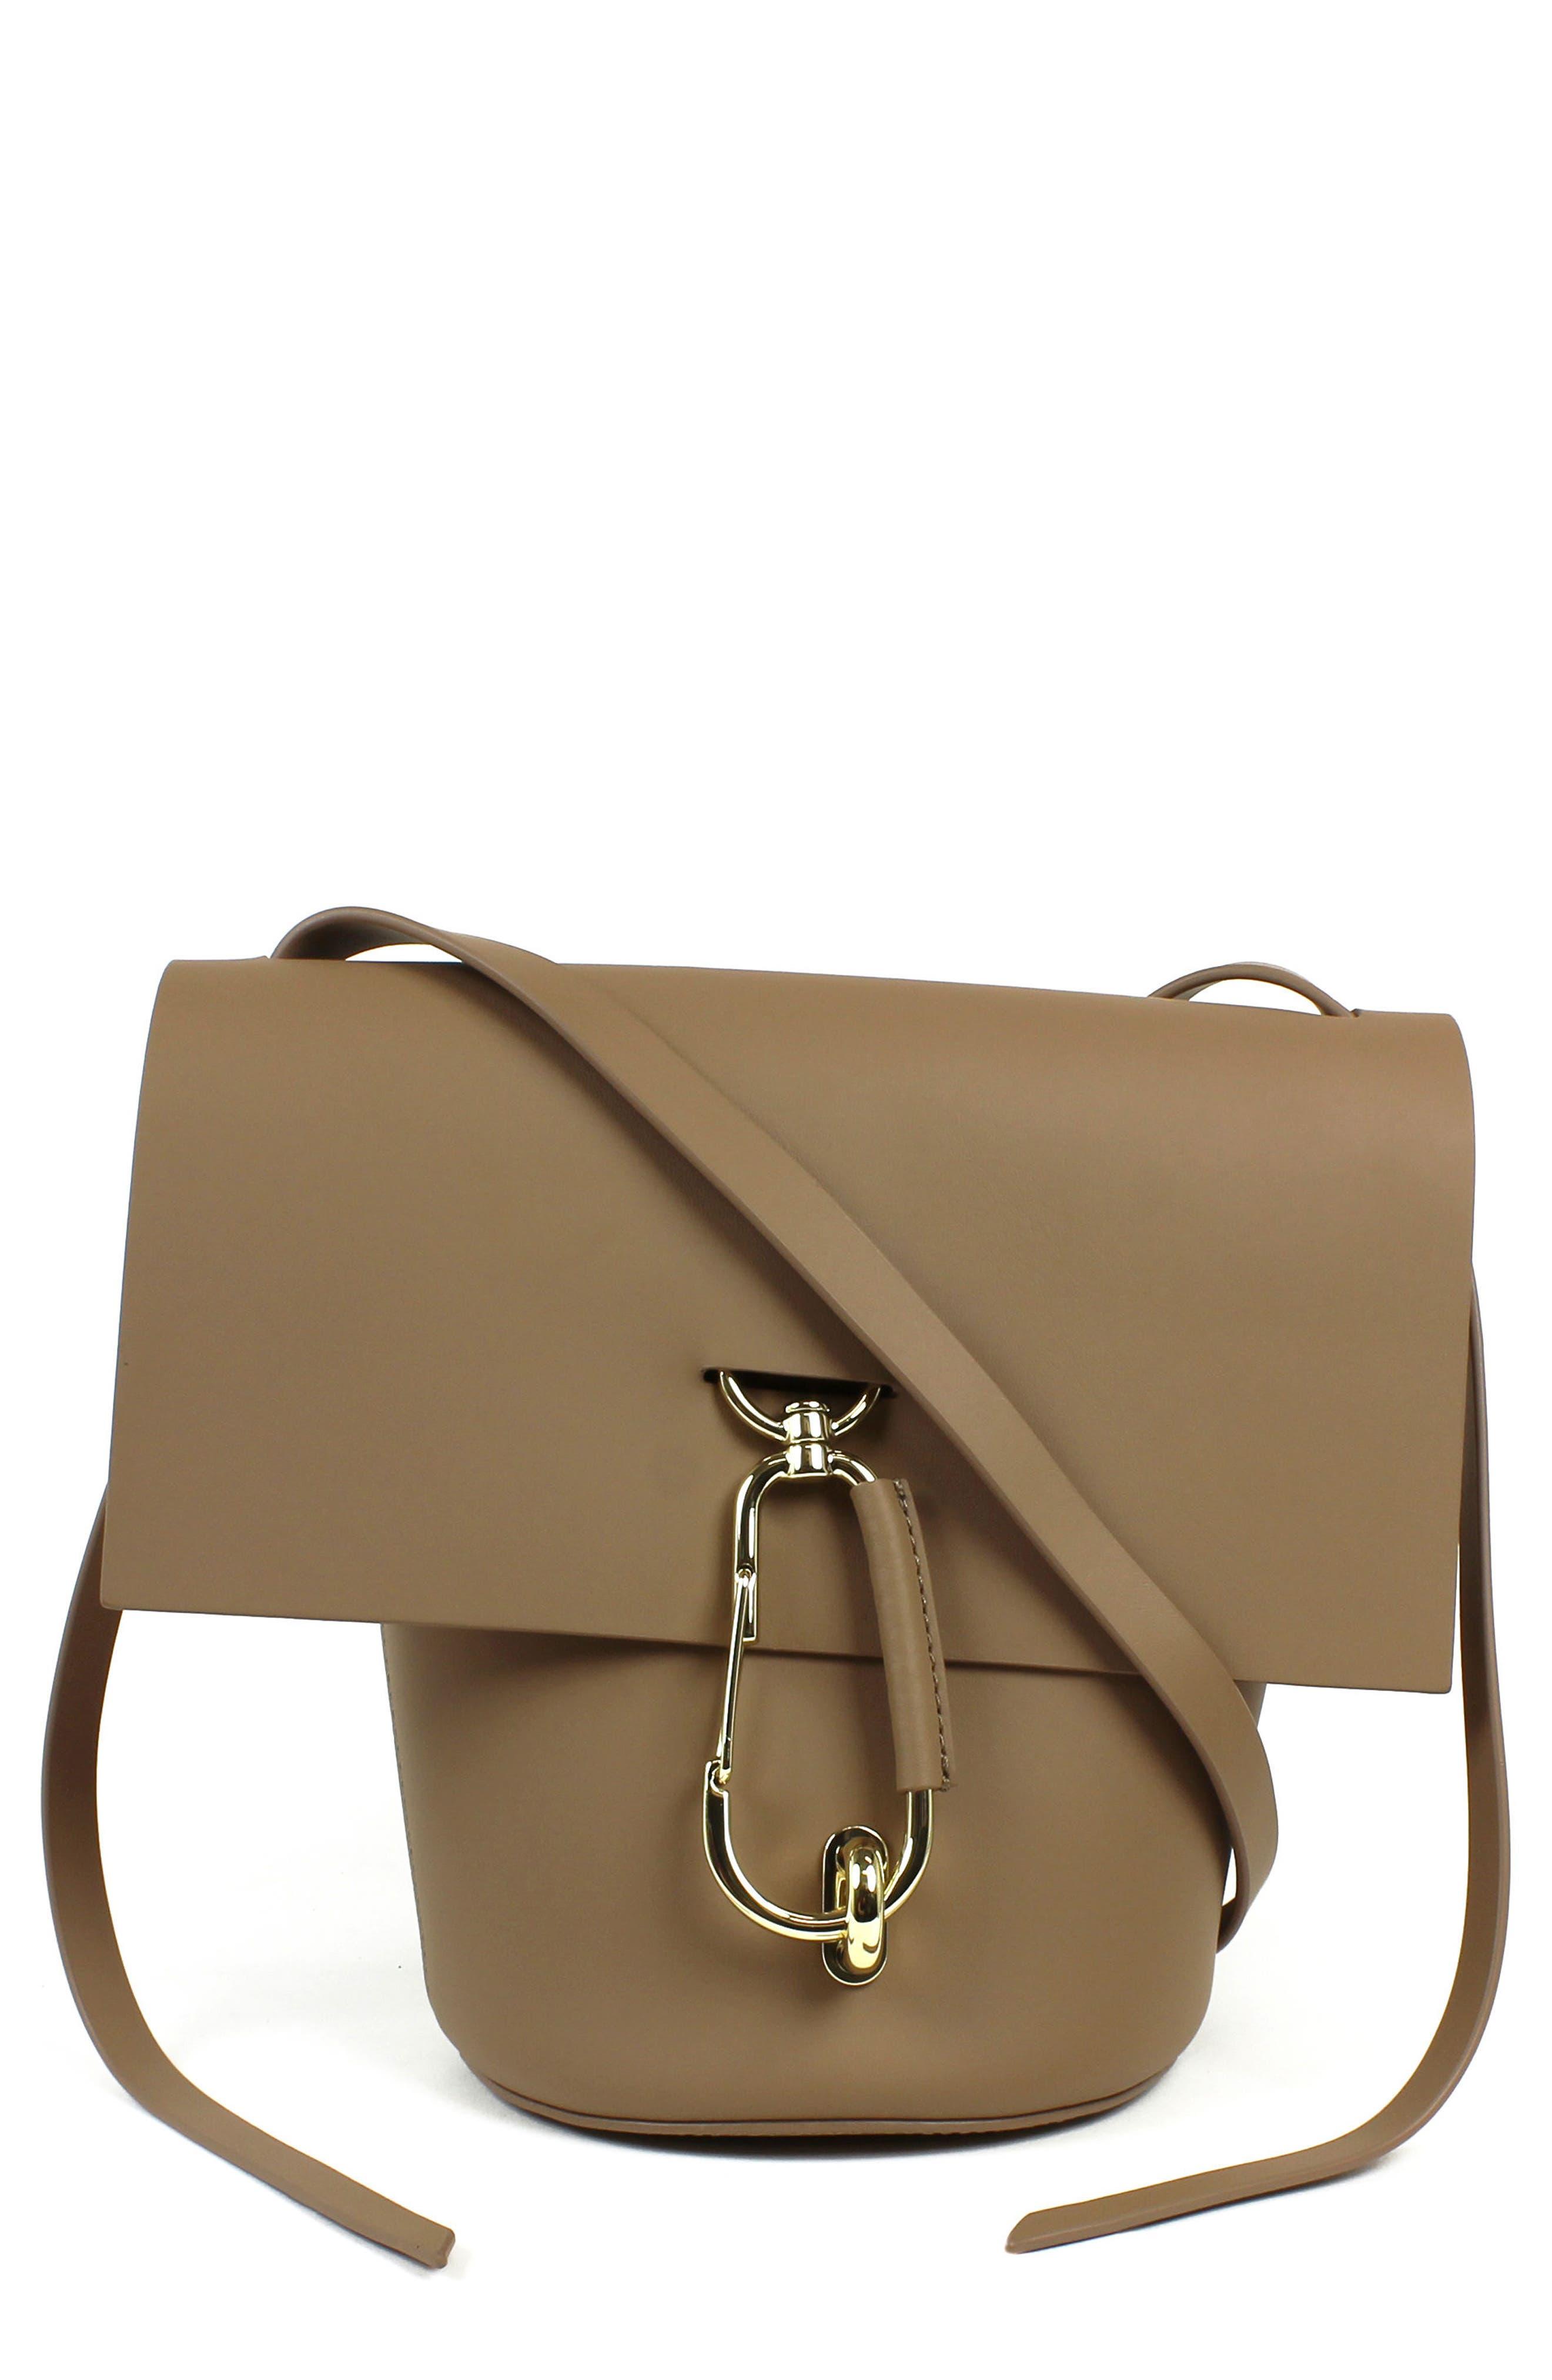 Belay Leather Bucket Bag,                             Main thumbnail 1, color,                             Seagull